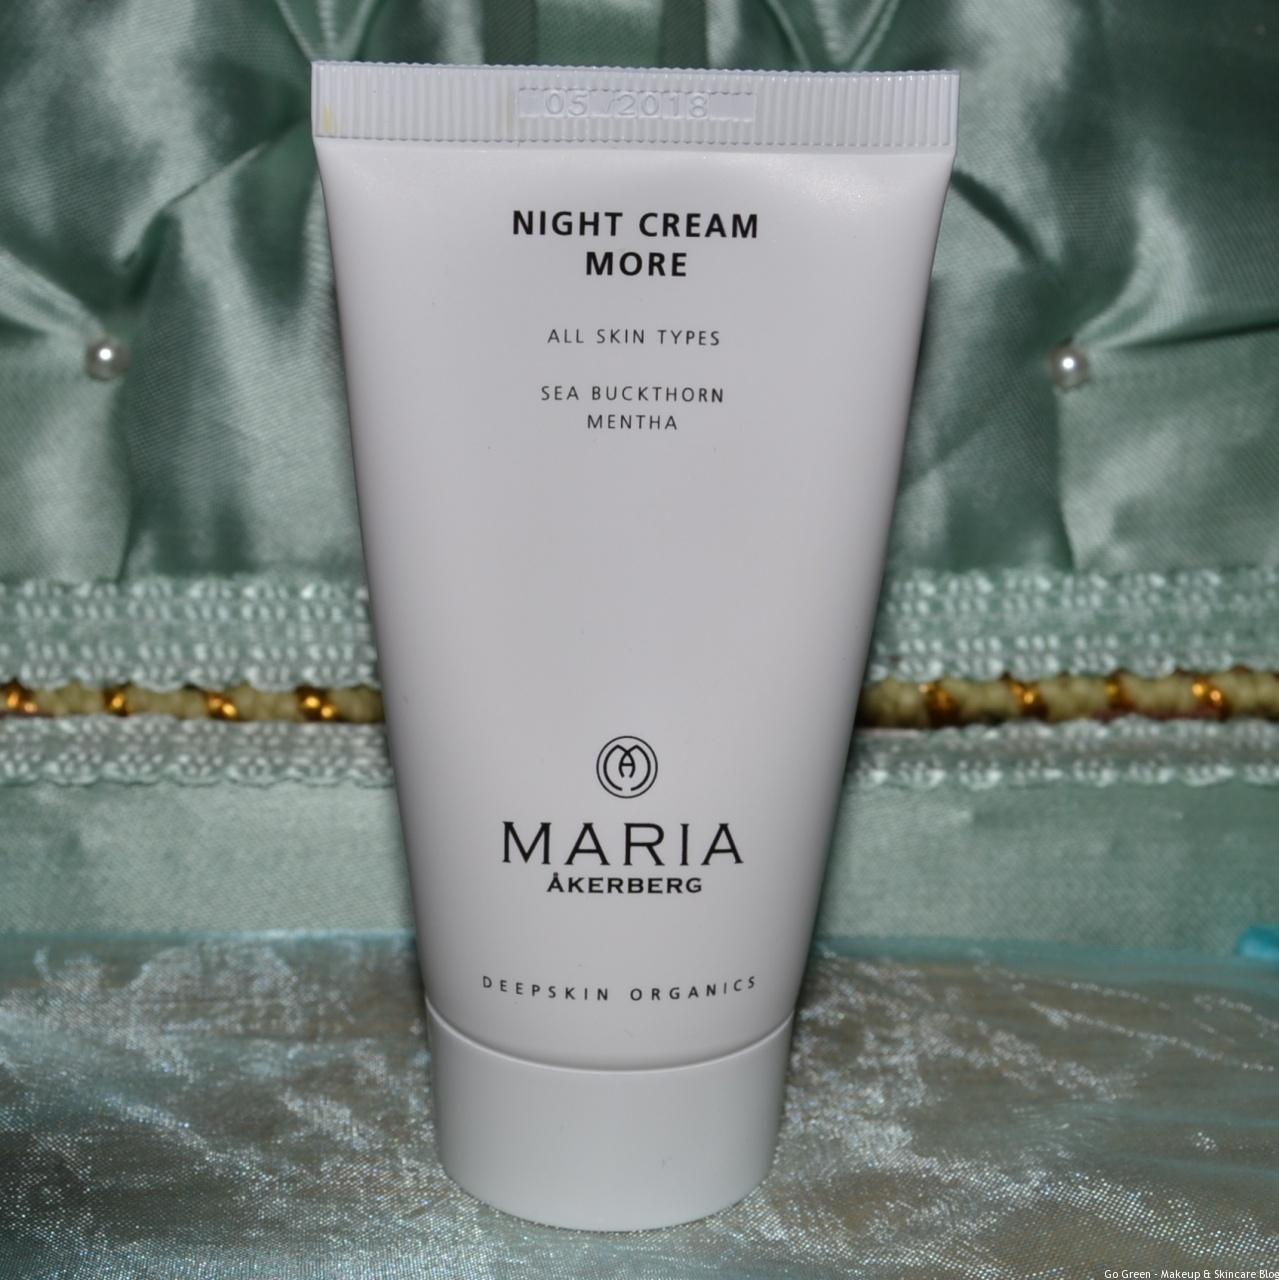 Maria Akerberg Deepskin Organics Night Cream More